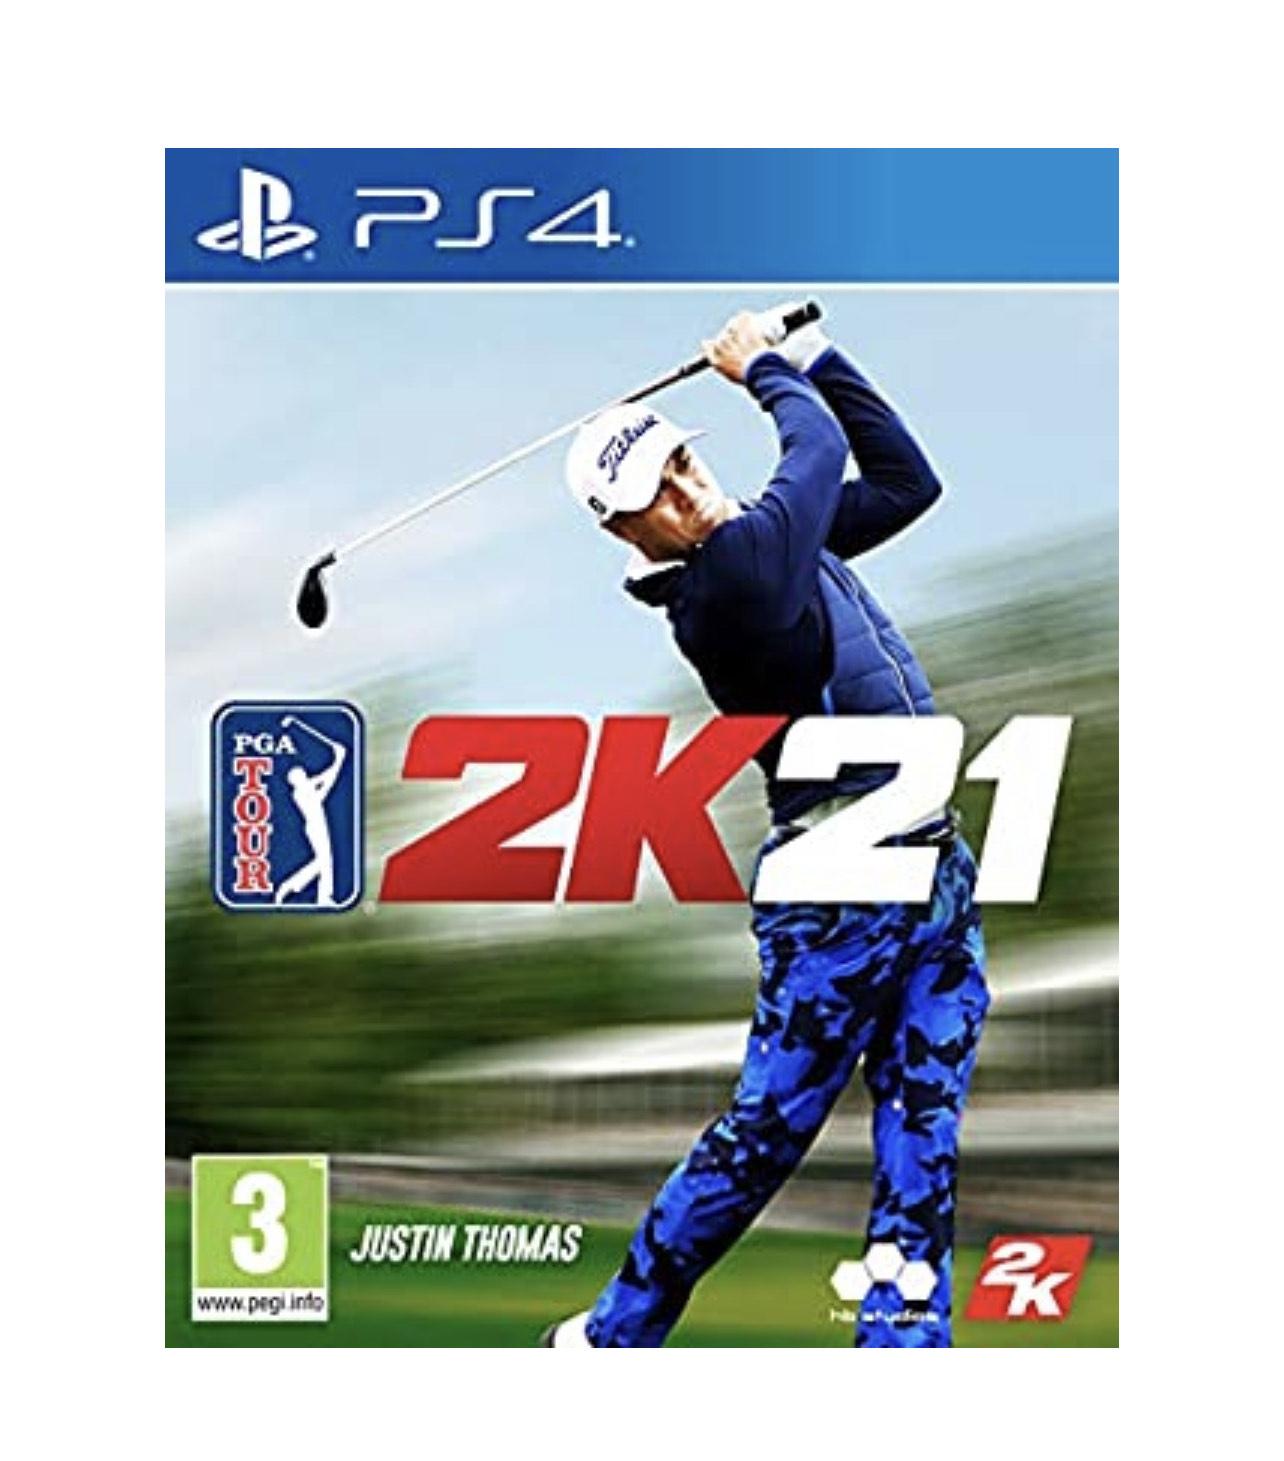 PGA Tour 2K21 sur Xbox One ou PS4